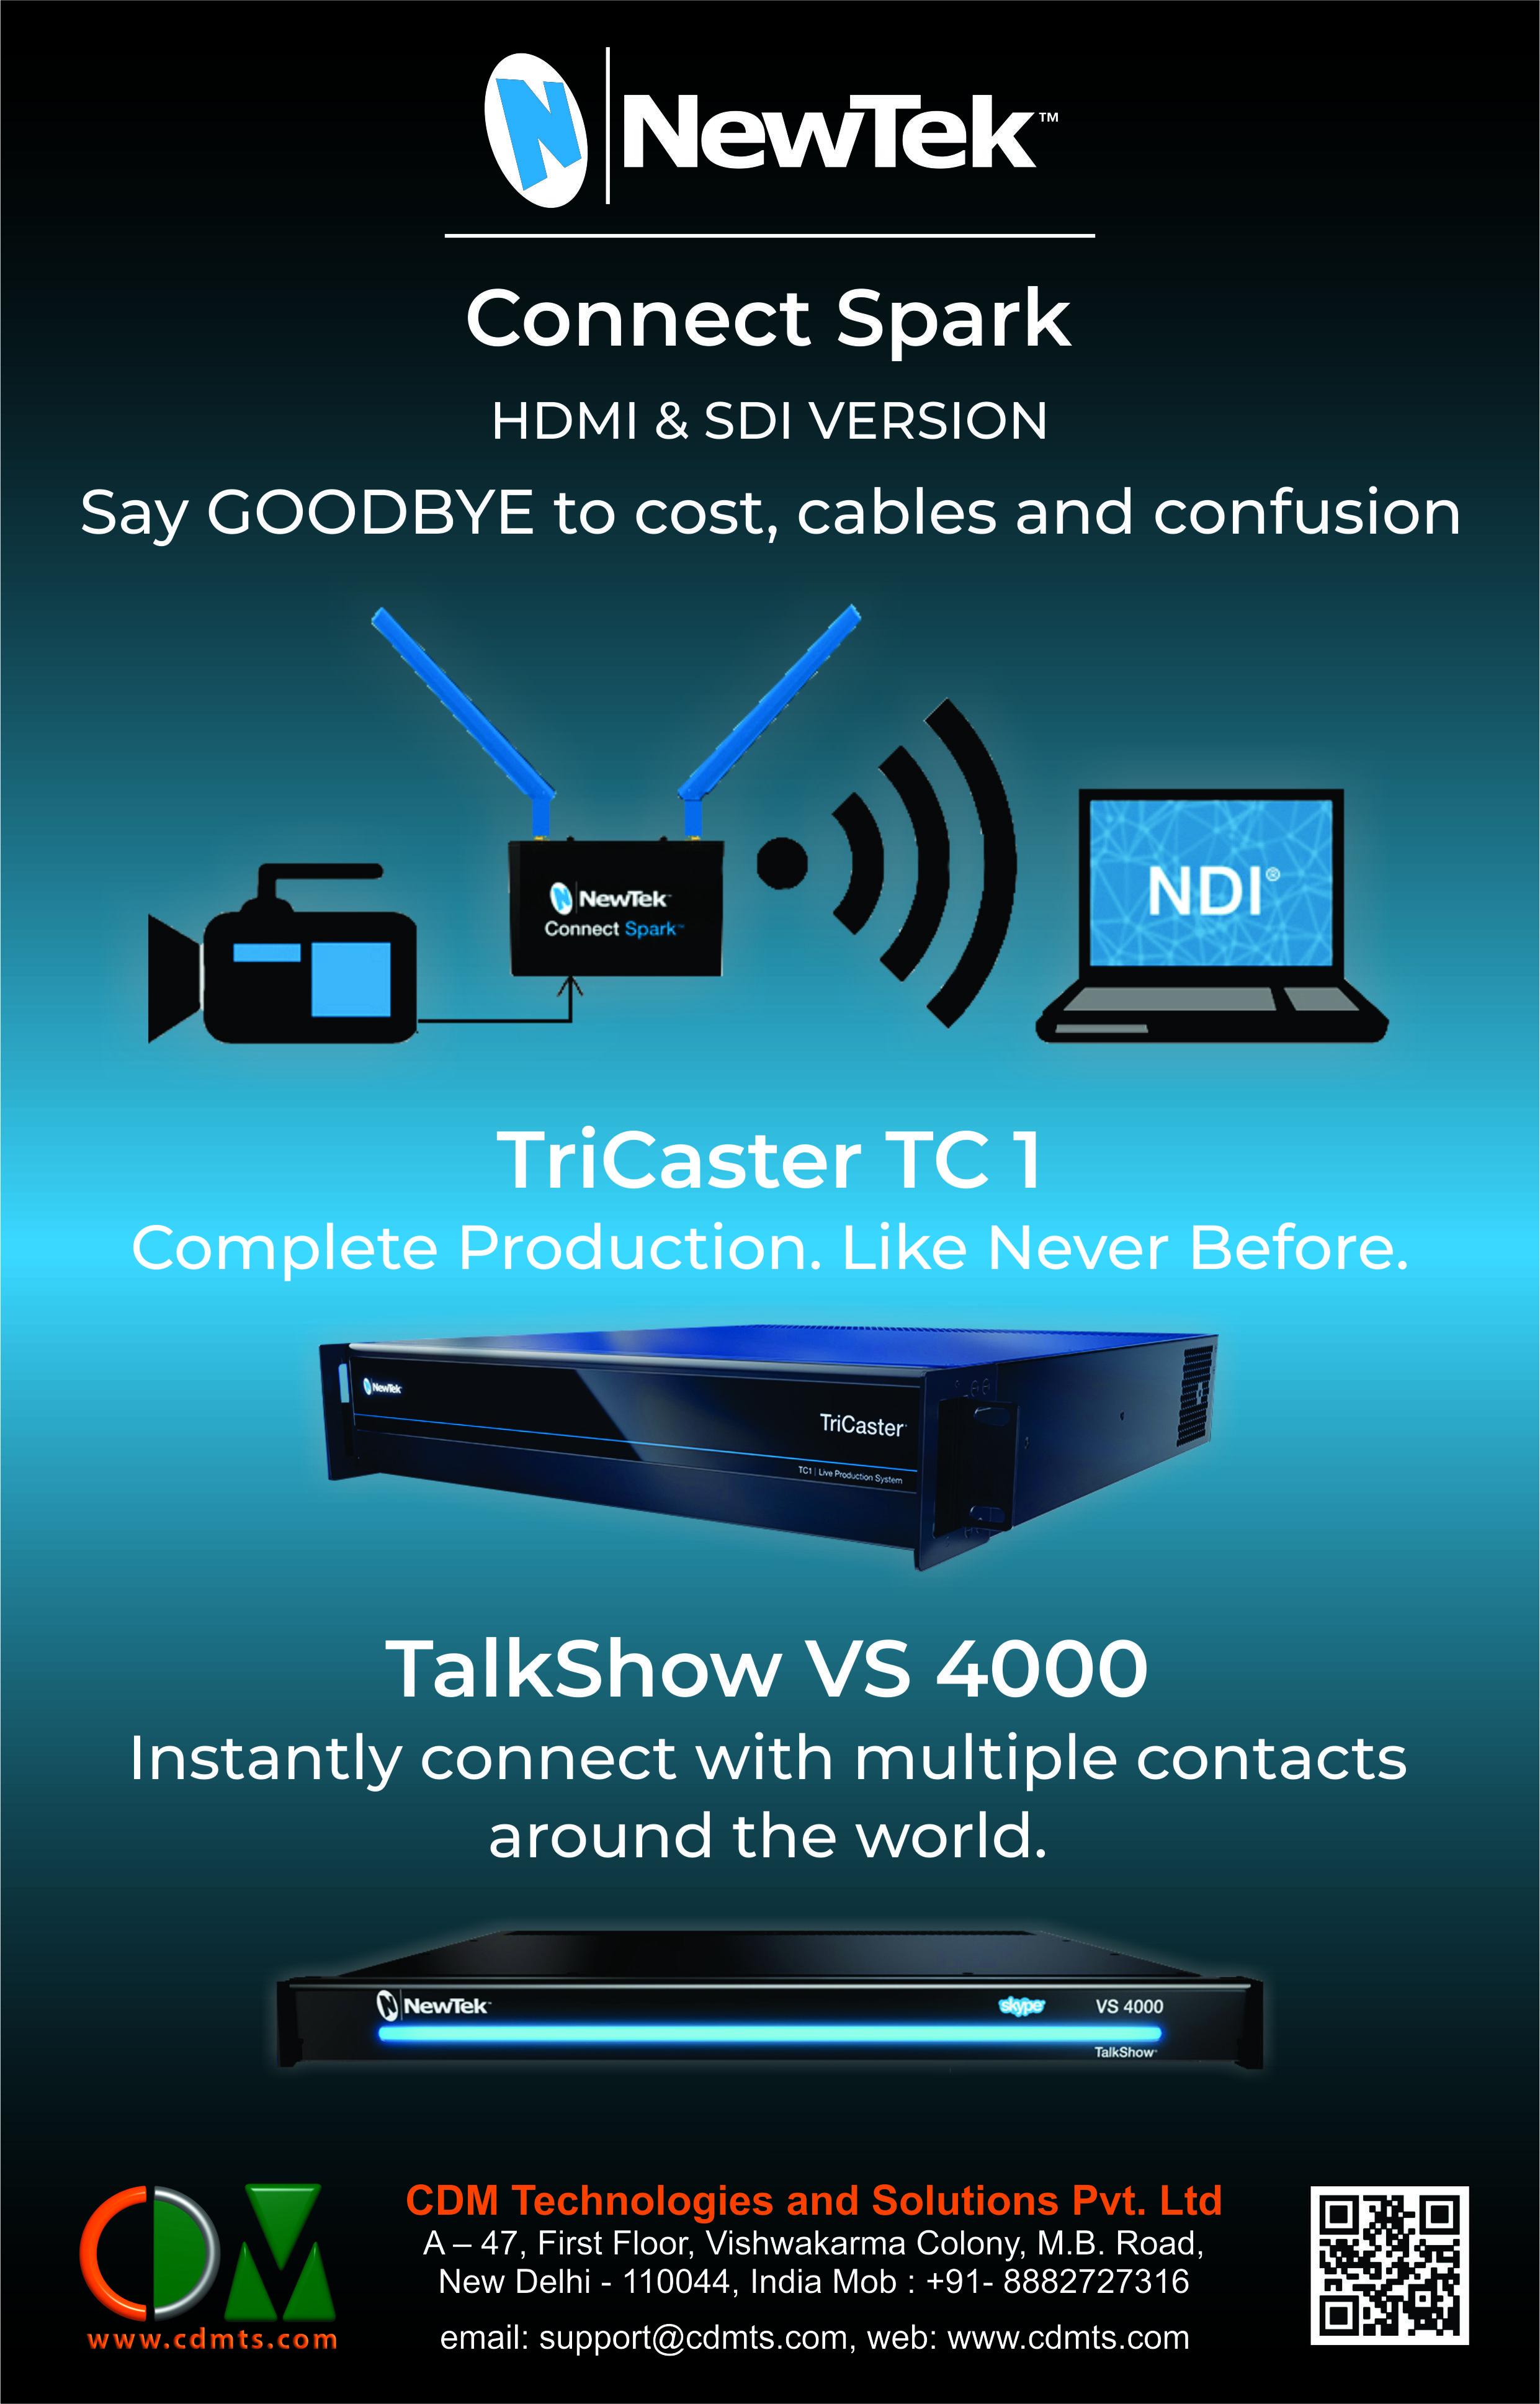 NewTek Connect Spark TriCaster TC 1 TalkShow VS 4000